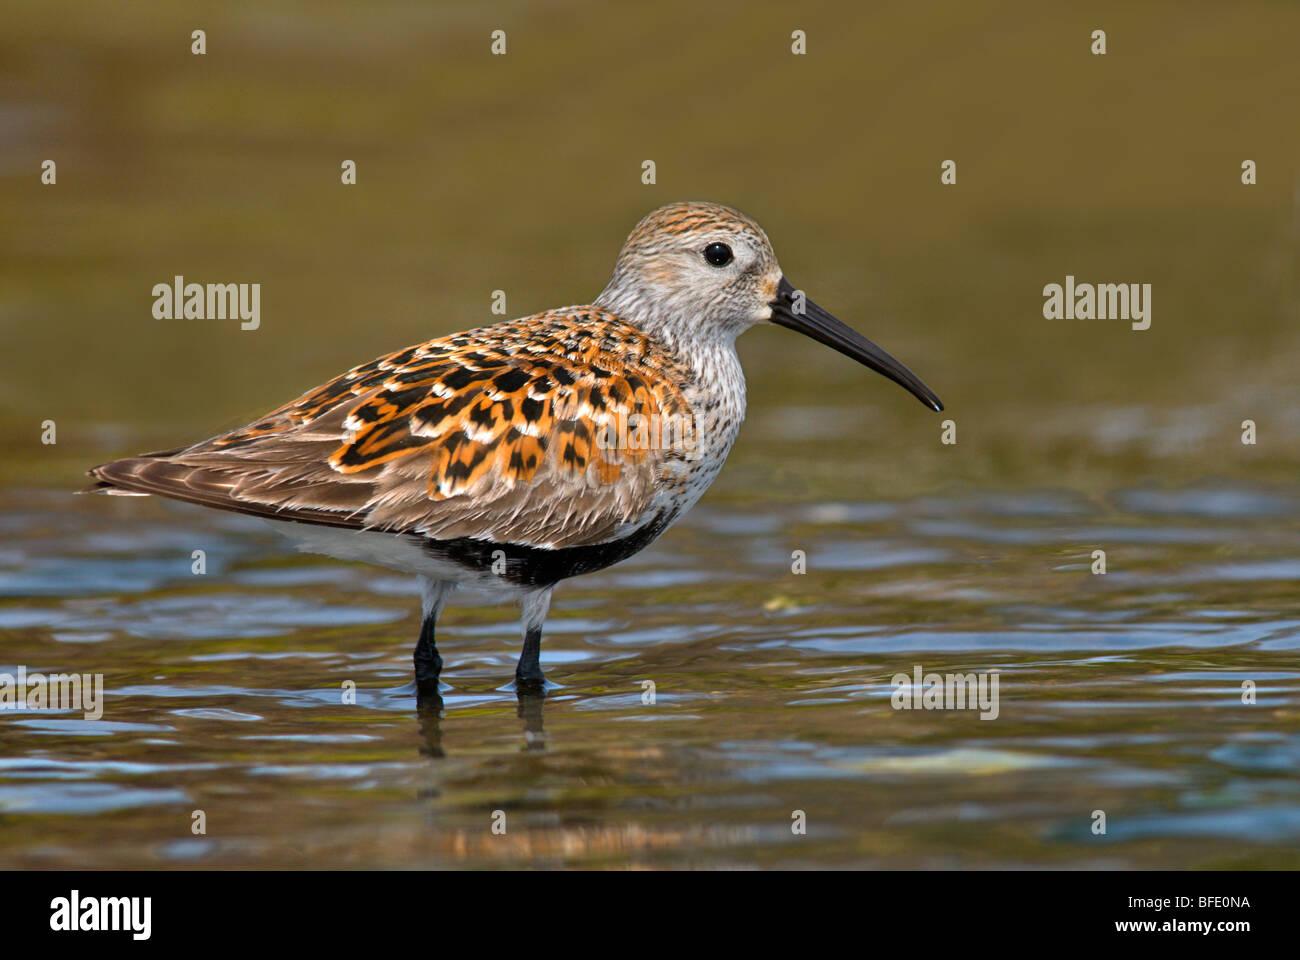 Breeding plumage on Dunlin (Calidris alpina), Oak Bay, Victoria, Vancouver Island, British Columbia, Canada - Stock Image